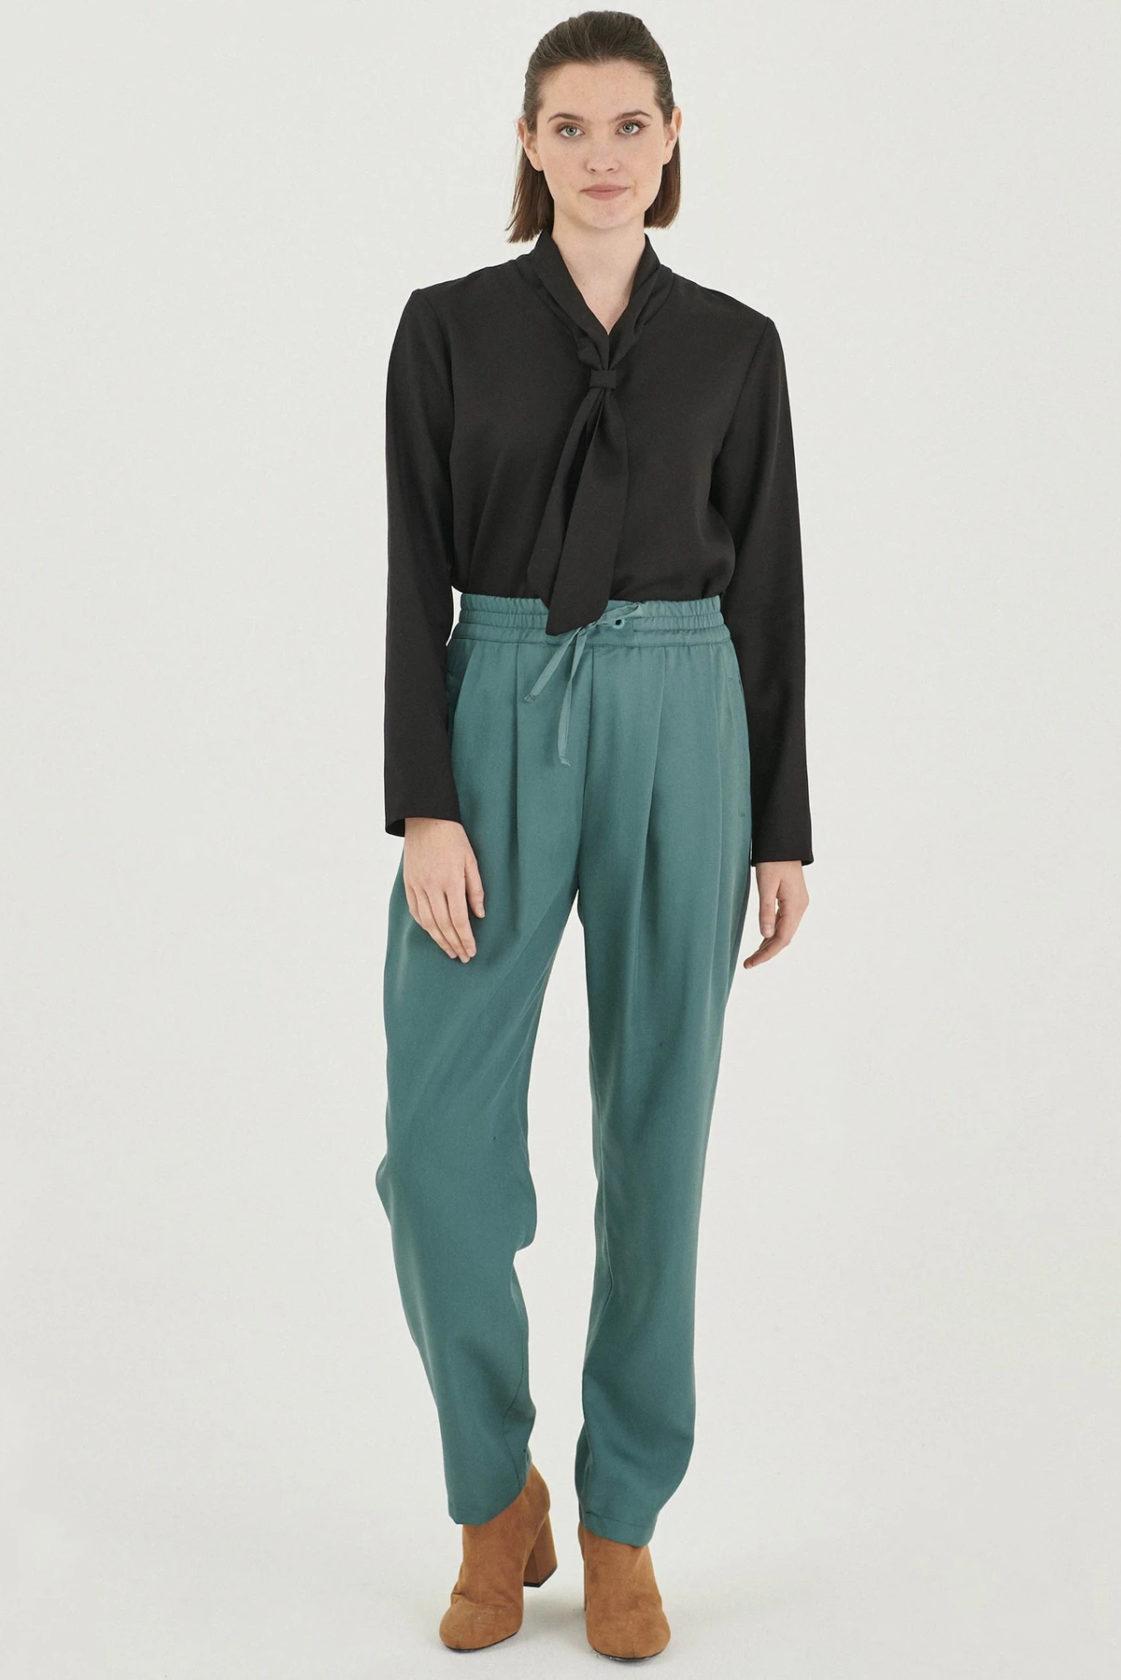 Roberta Organic Fashion Organication Hose Seaweed